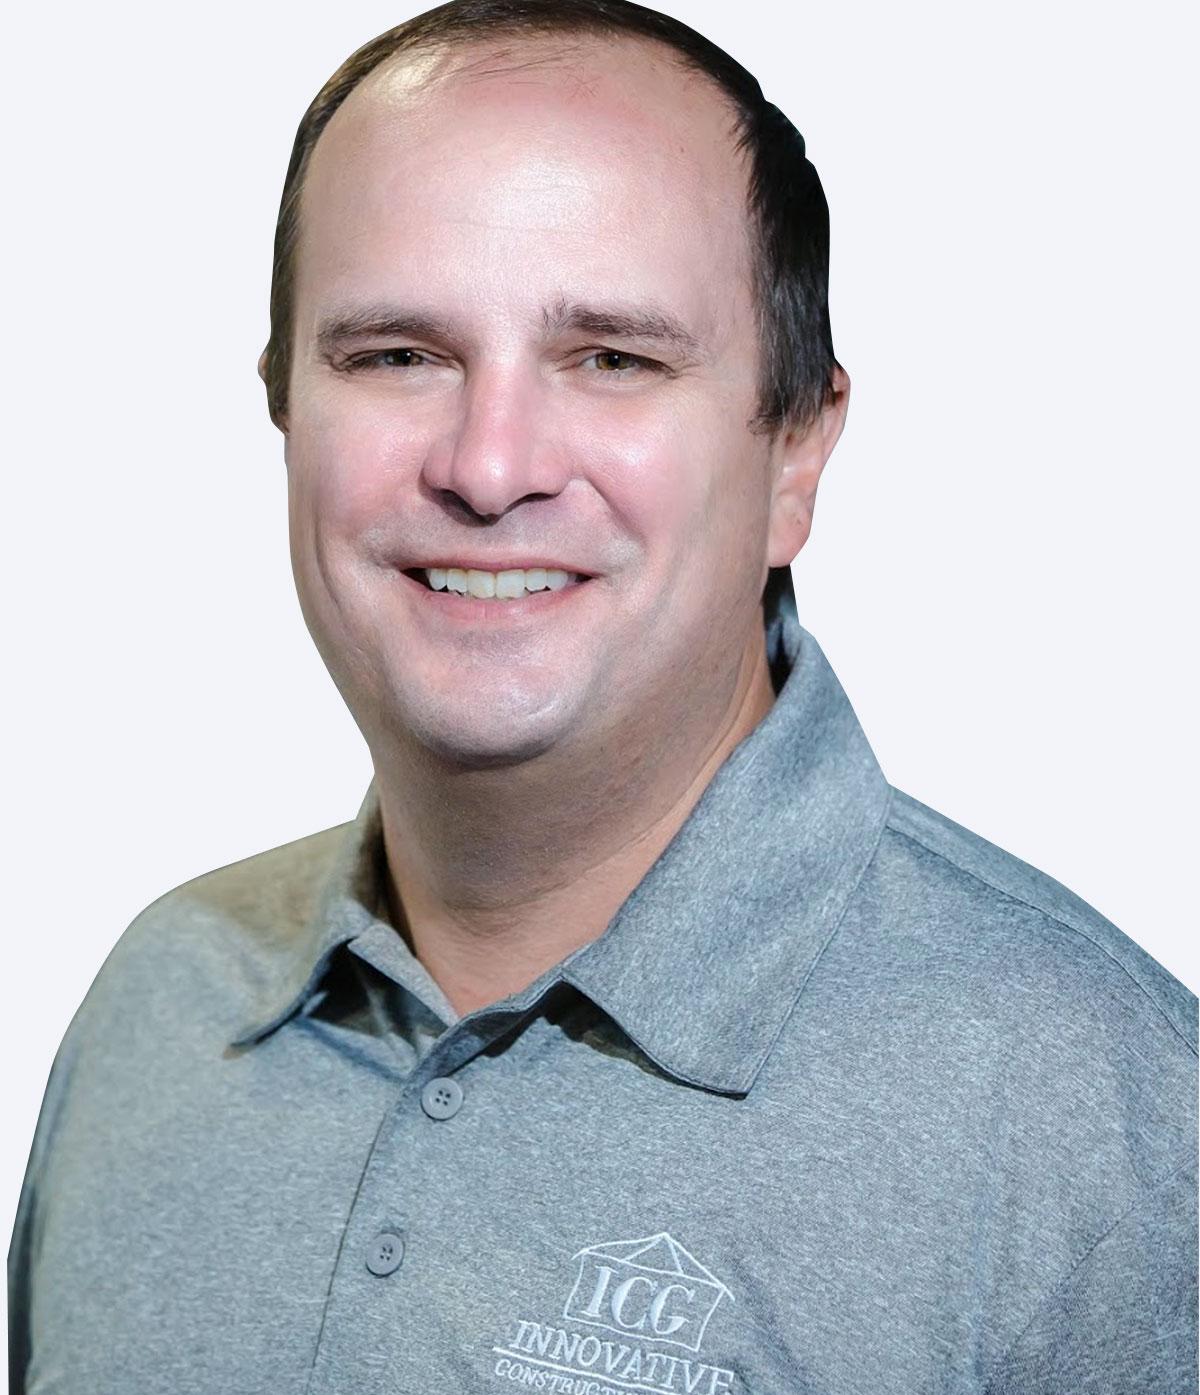 Chris Pisano